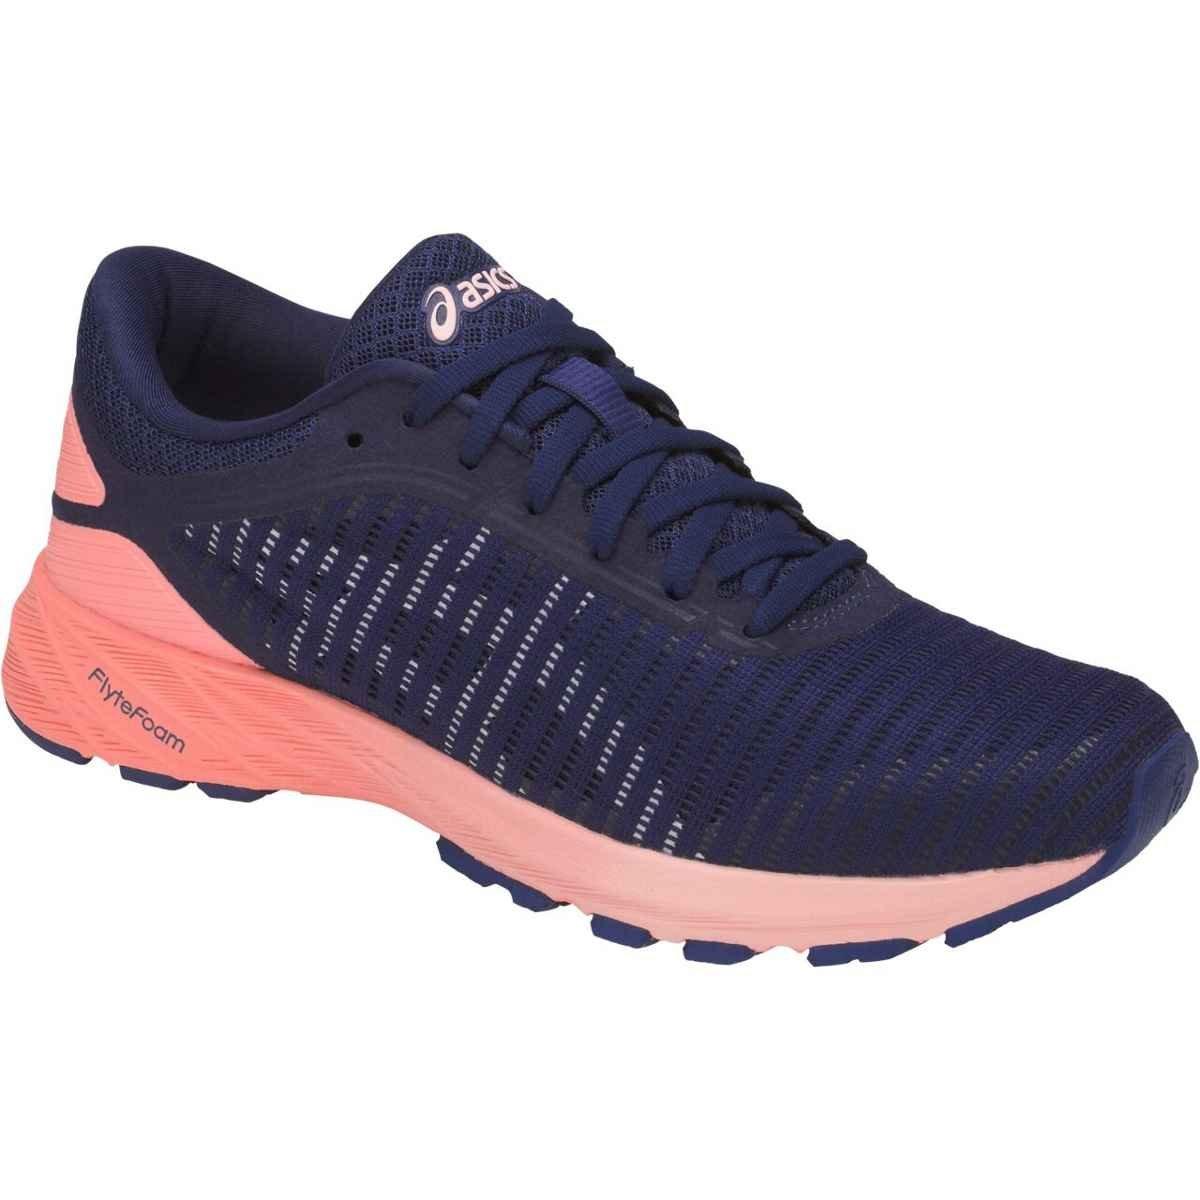 ASICS Women's Dynaflyte 2 Running Shoe B072LMW11X 5 B(M) US|Indigo Blue/White/Begonia Pink